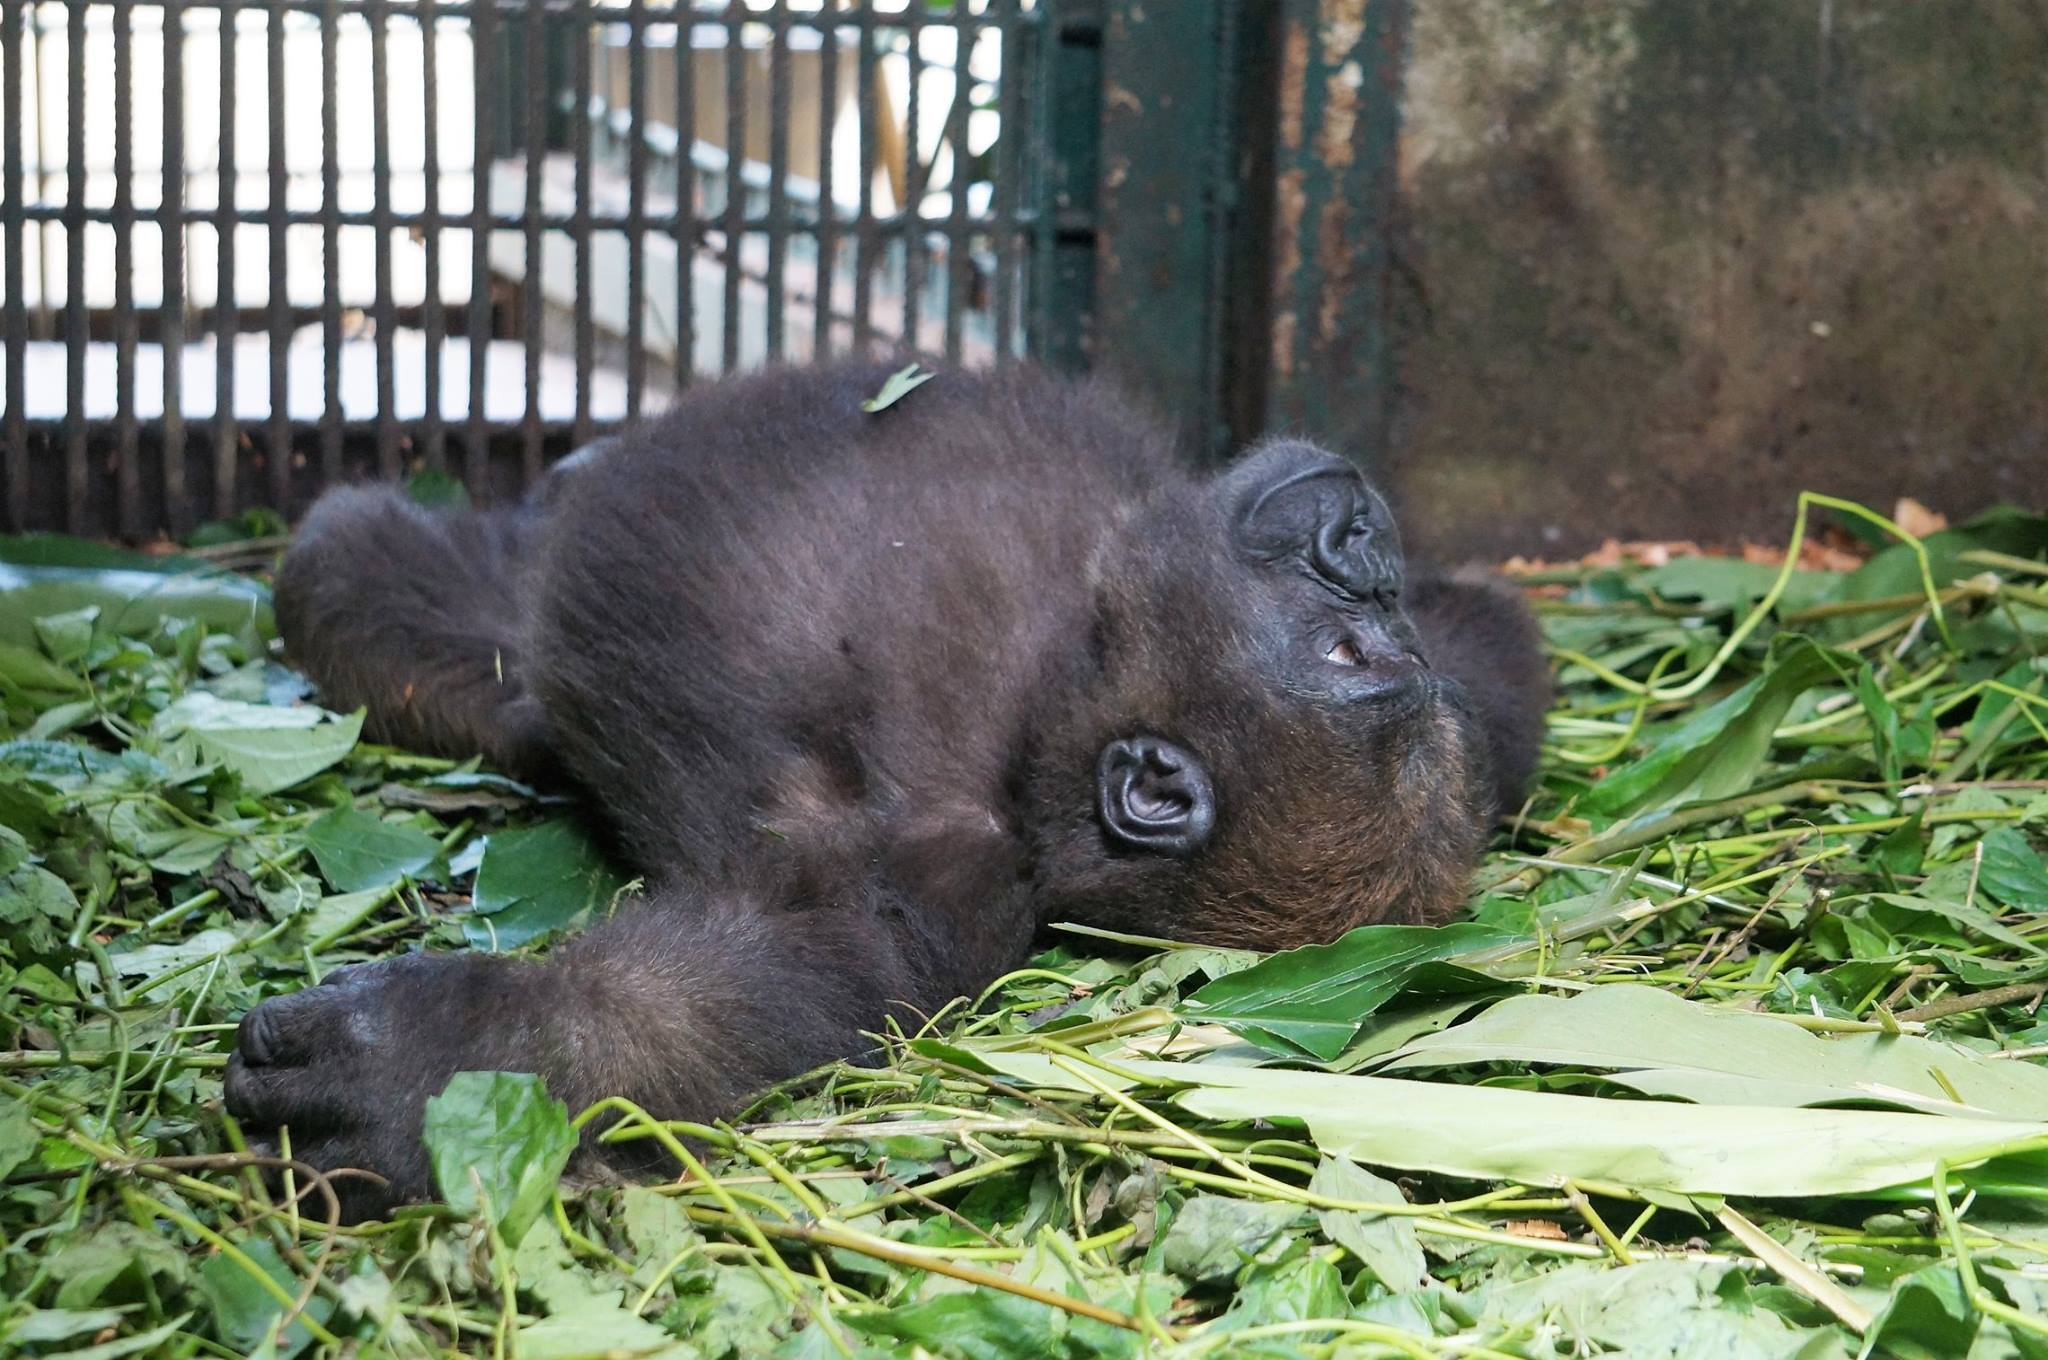 parry-gorilla-5